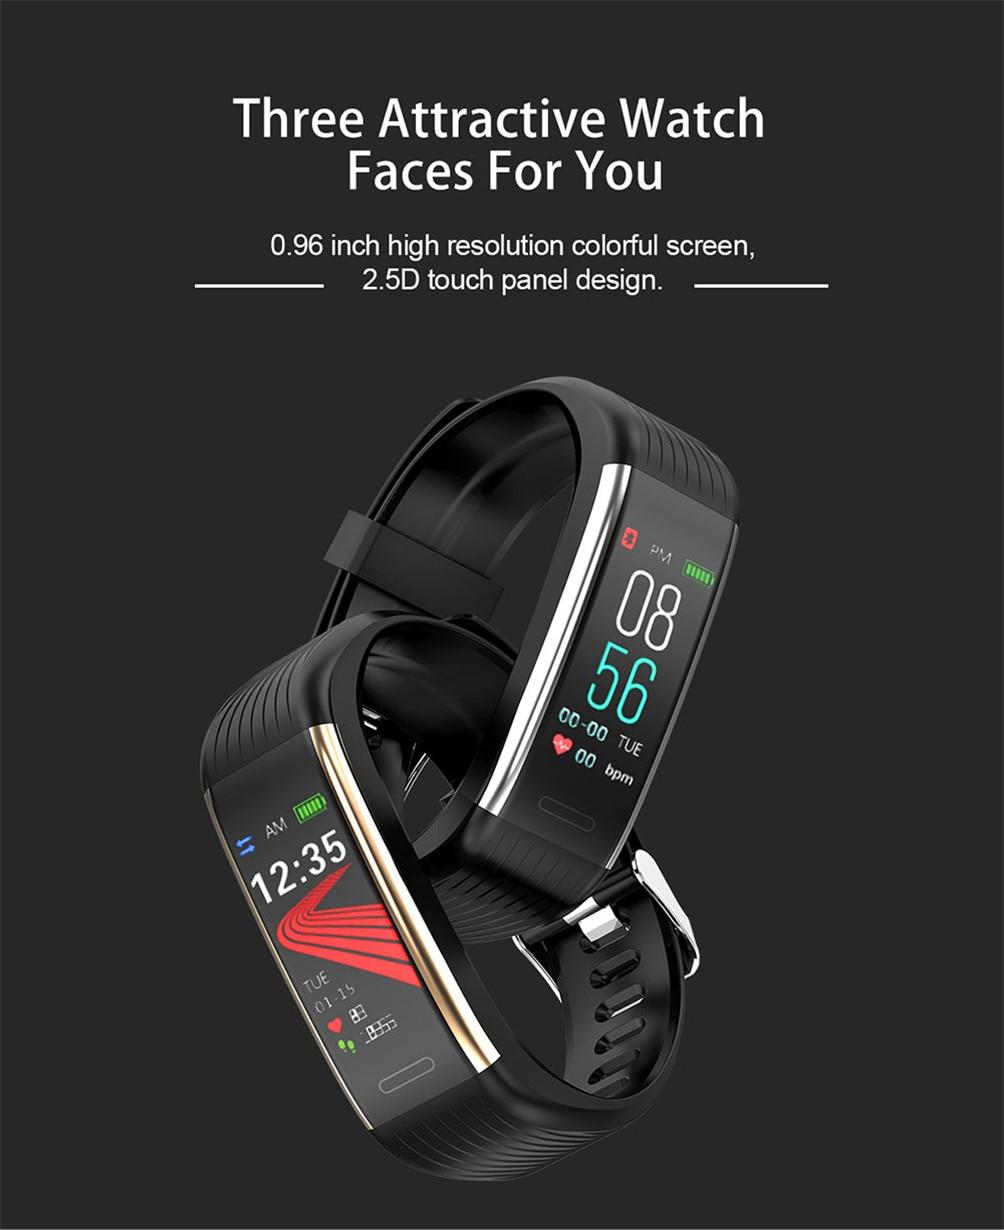 H62dee16ef61e486eb5822bfece60f775T 2020 Smart Wristband Fitness Bracelet Blood Pressure Measurement Smart Bracelet Heart Rate Waterproof Pedometer Smart Band Watch